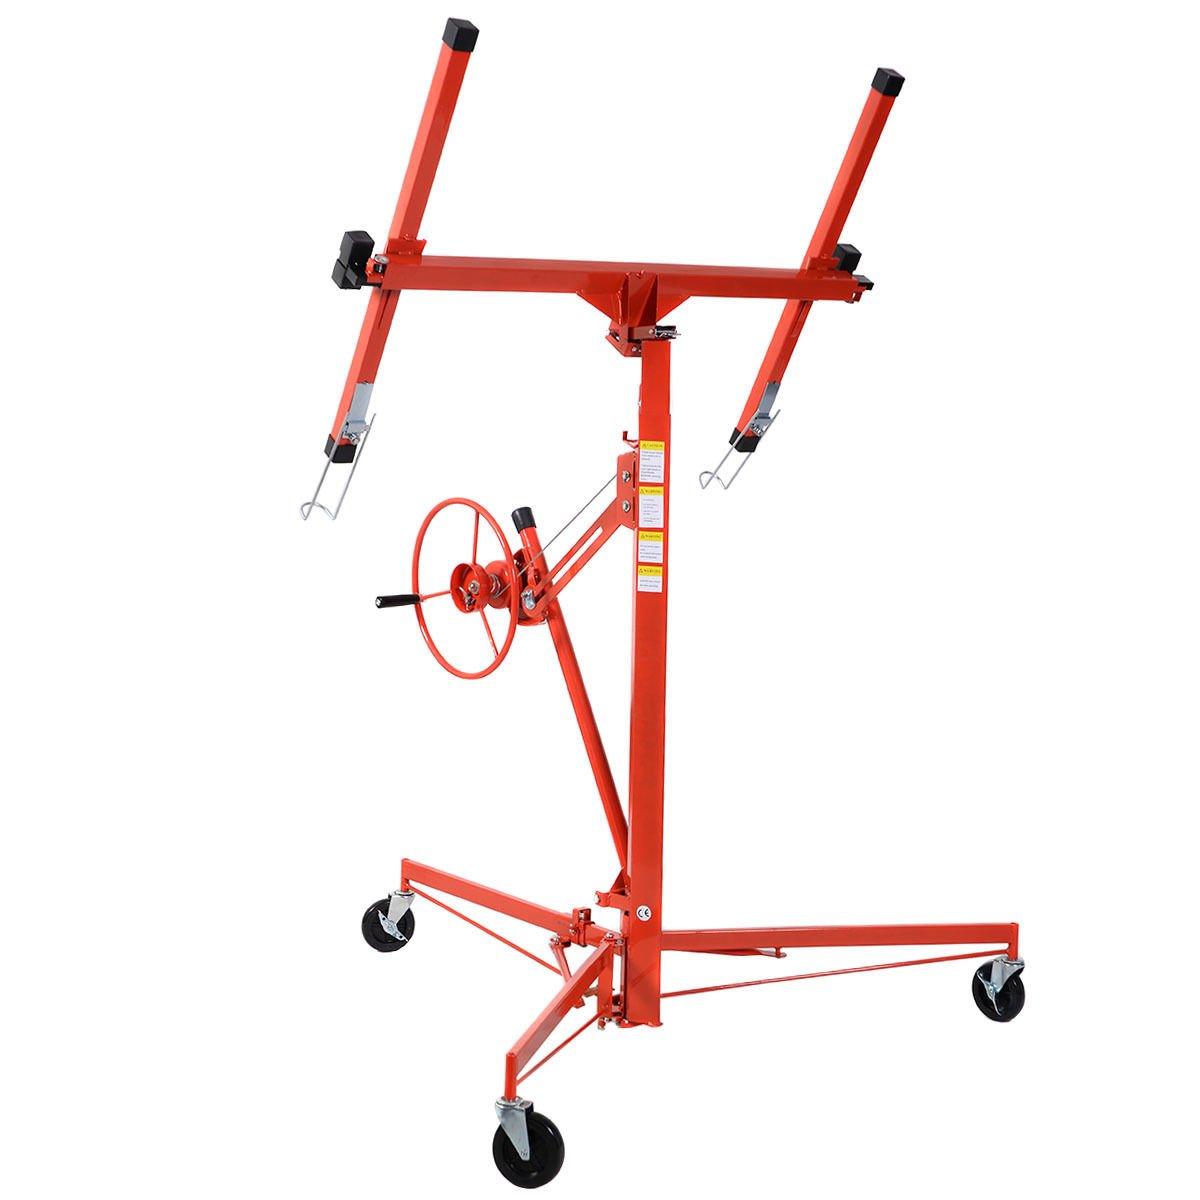 Goplus Drywall Lift 11' Panel Hoist Jack Lifter Construction Tools Lockable w/ Caster Wheel, Red